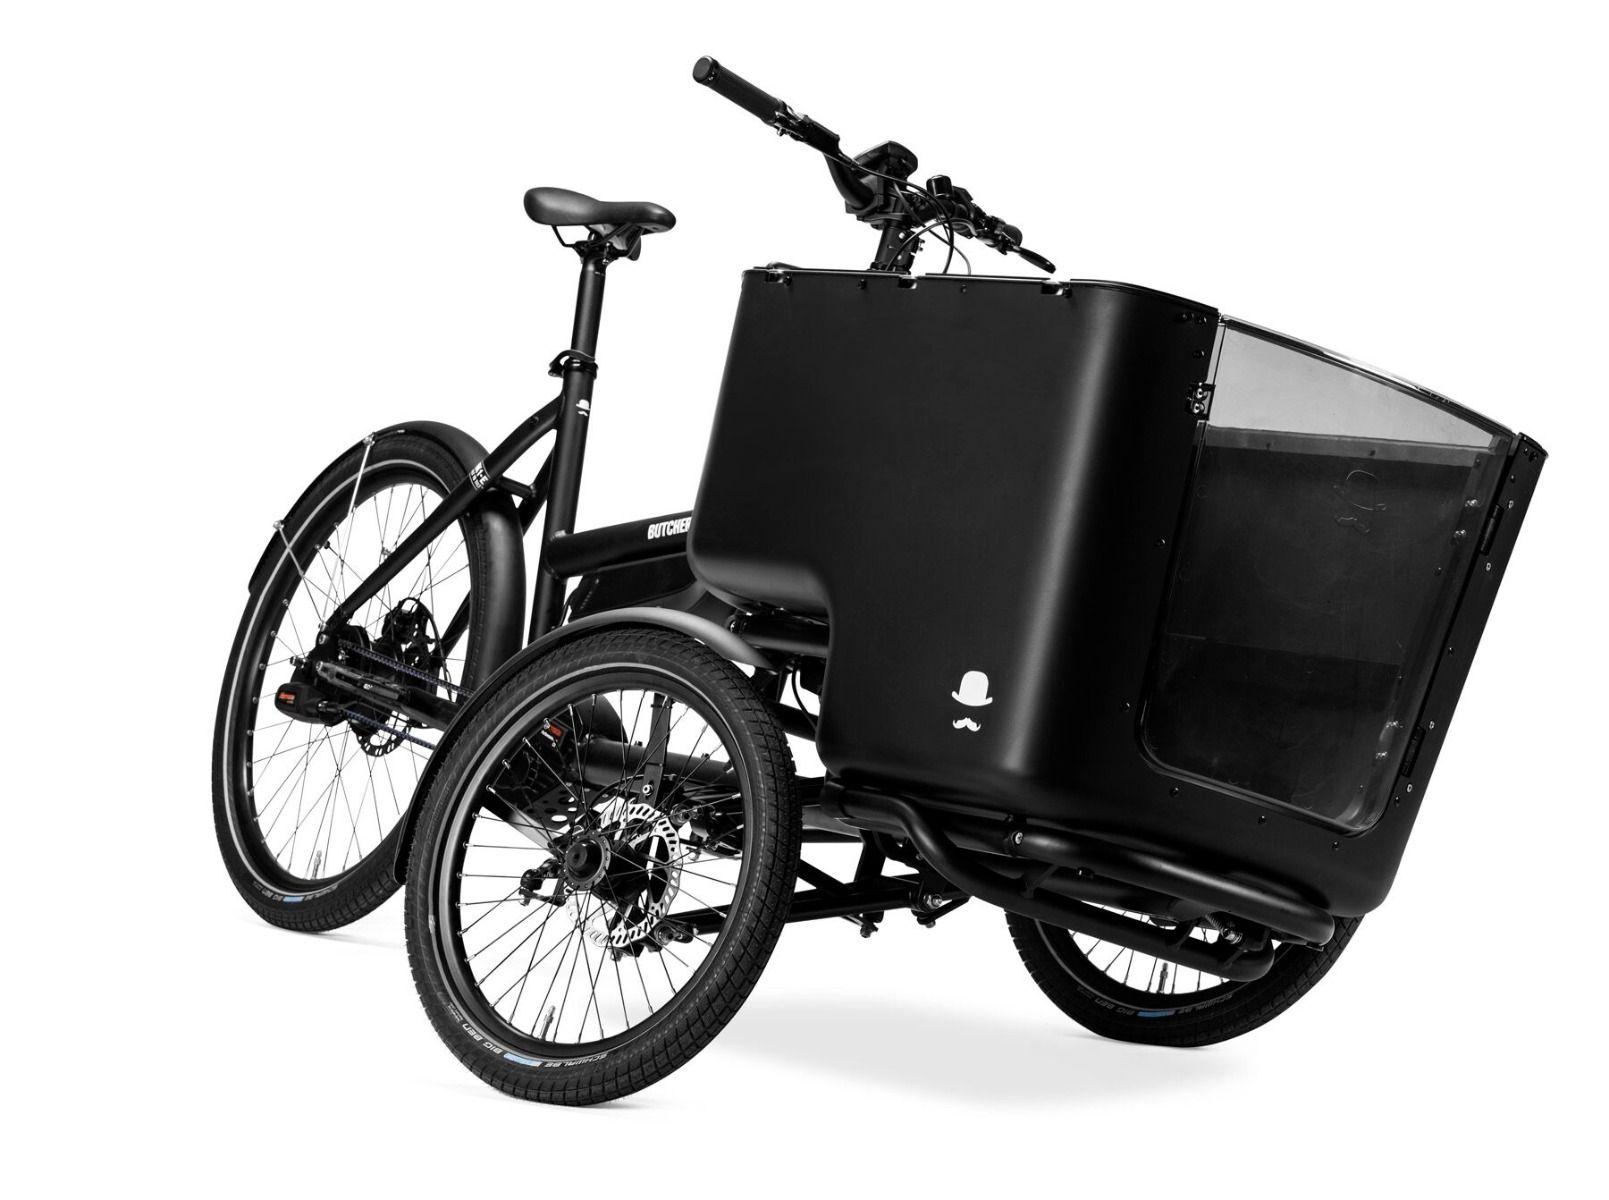 Voorkant van de Butchers & Bicycles MK1-E